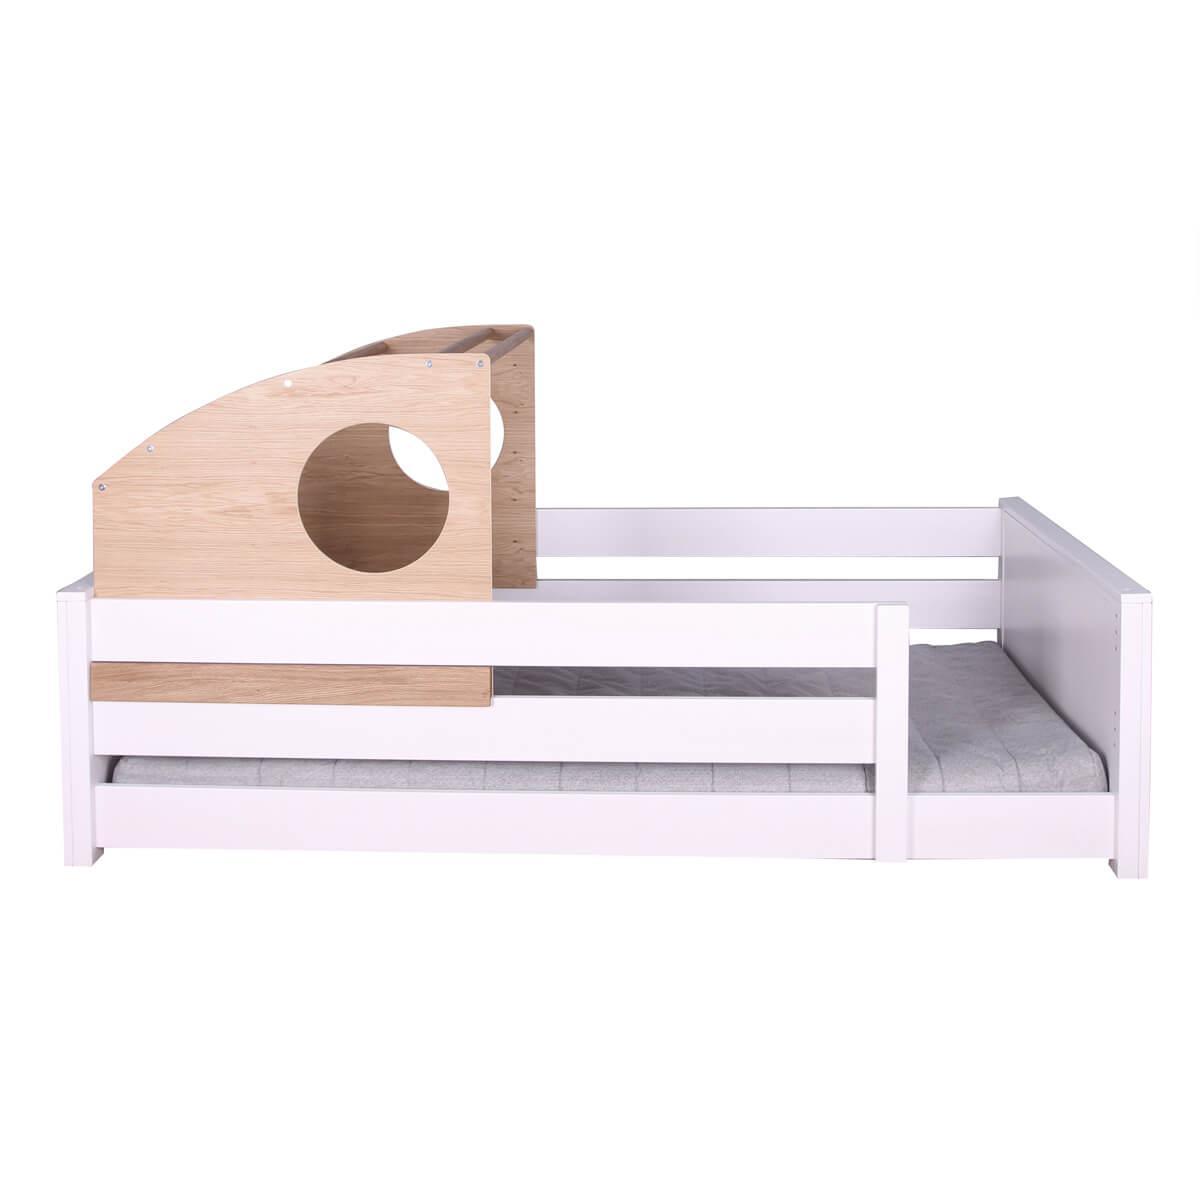 Lit montessori-cabine coulissante chêne KASVA hêtre massif laqué blanc